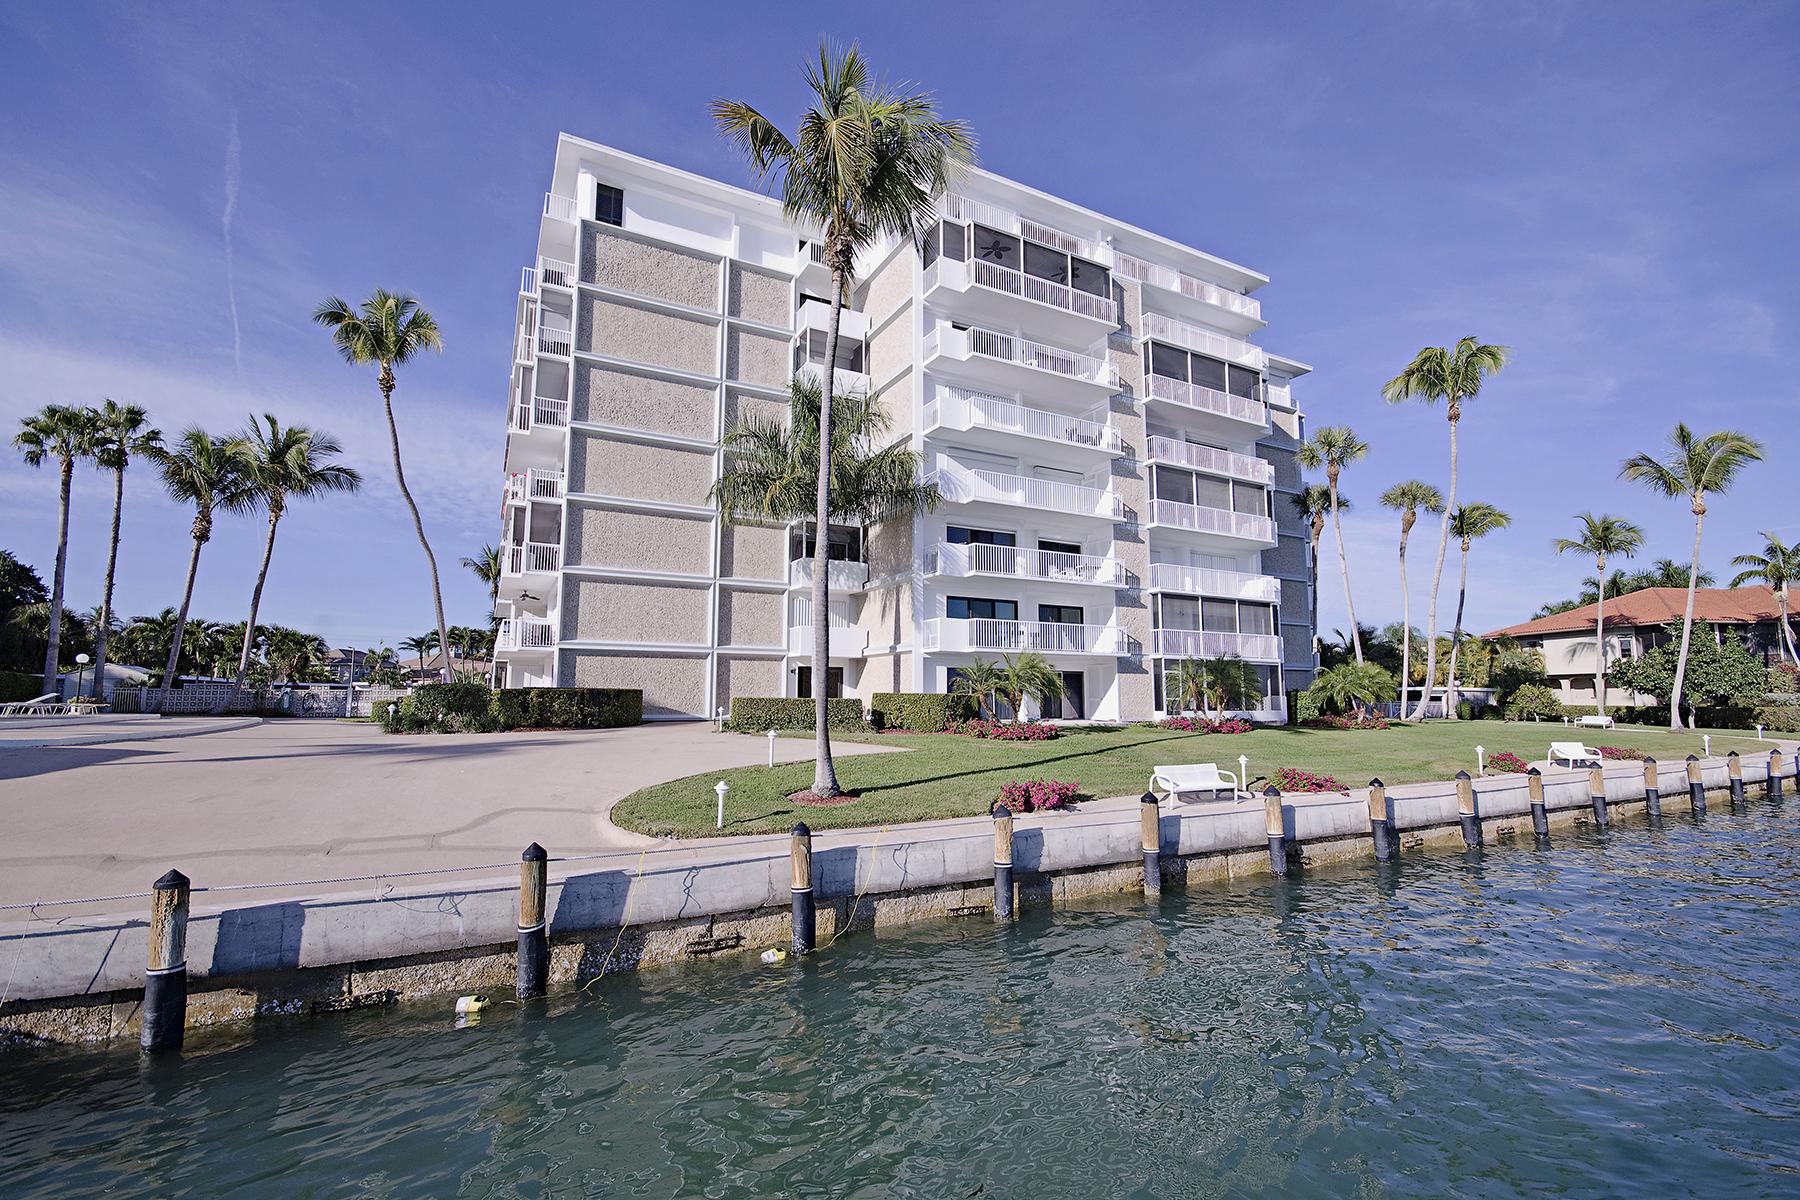 Condomínio para Venda às ISLES OF CAPRI - MARCO TOWERS 60 Pelican St 302 Naples, Florida 34113 Estados Unidos